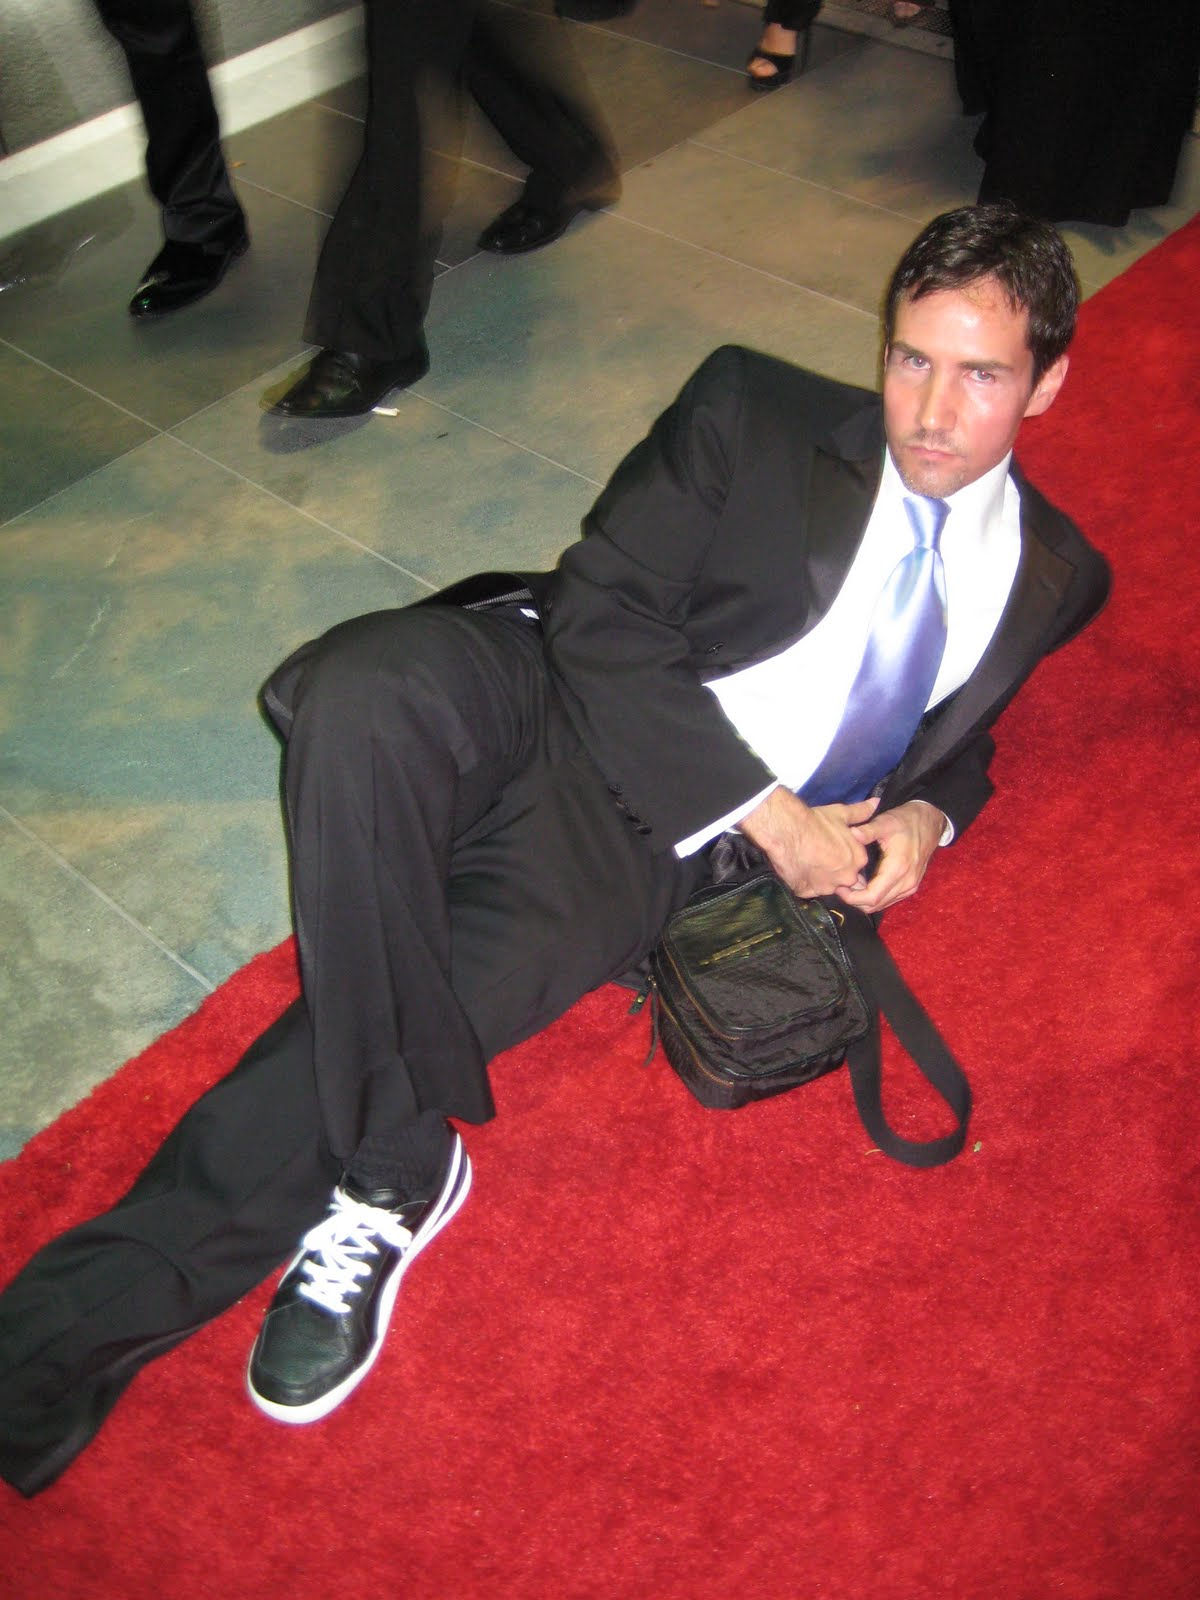 http://2.bp.blogspot.com/_NRc3wPeWHaM/TQFj_RuGP4I/AAAAAAAAAZA/MEq4C-xomuk/s1600/LA-Emmys%252B09%252B158.jpg